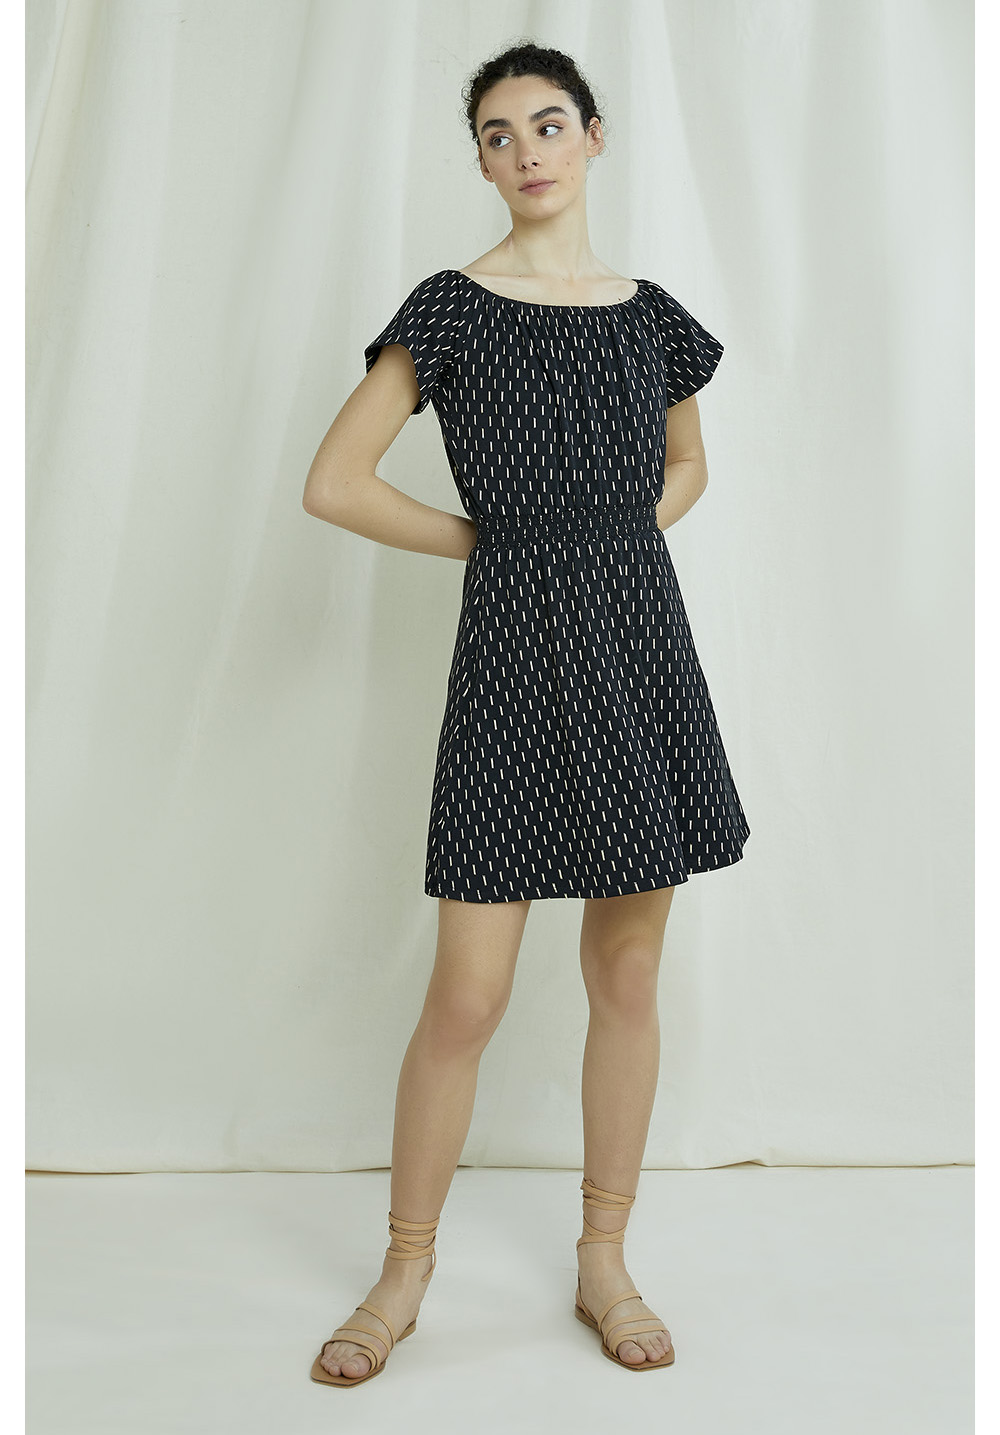 Ingrid Ikat Print Dress 10